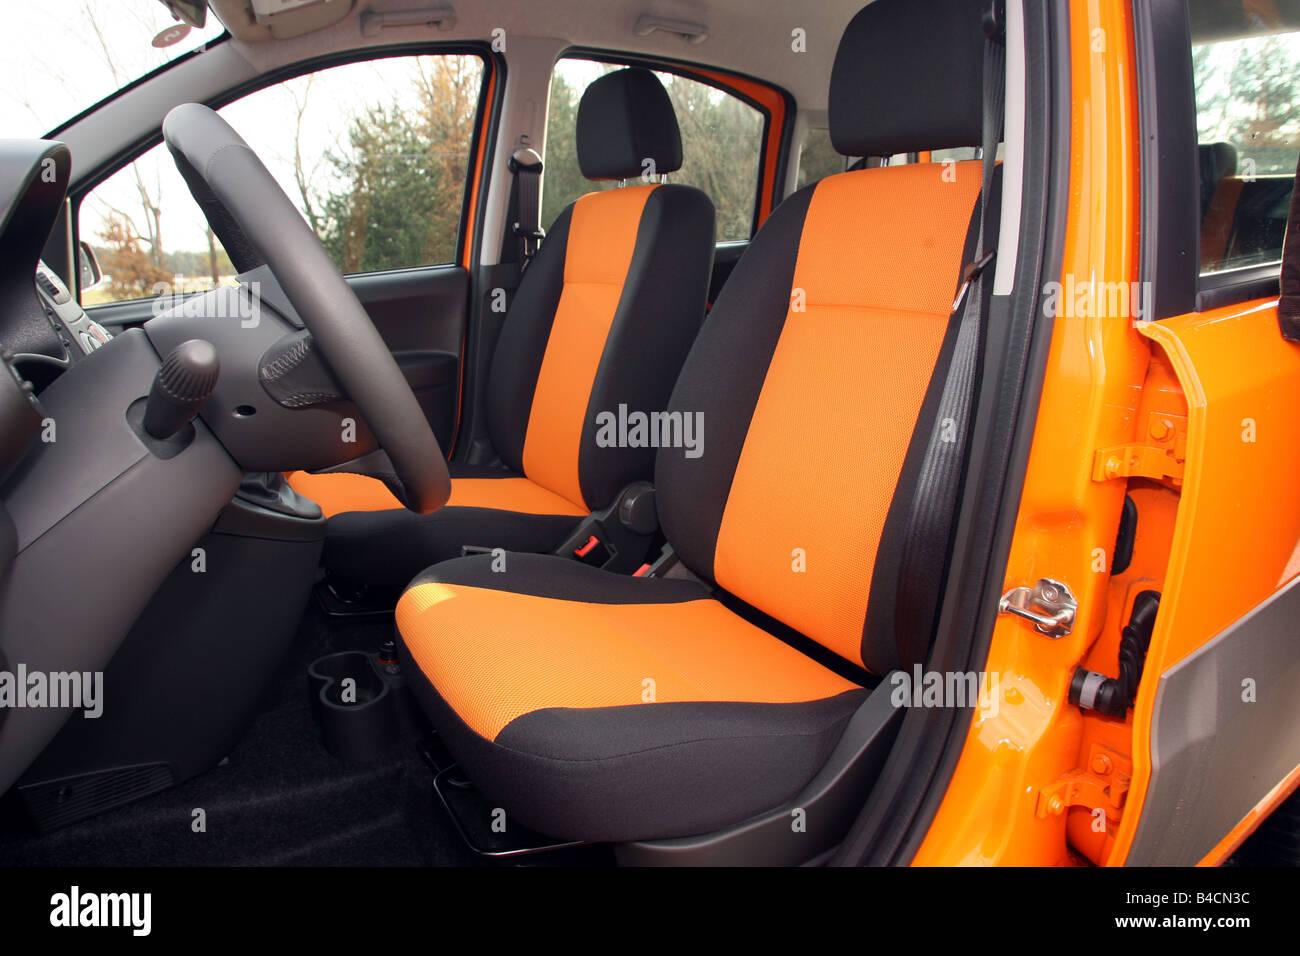 Fiat Panda 1.3 Multijet 16V 4x4, model year 2006-, orange , interior ...